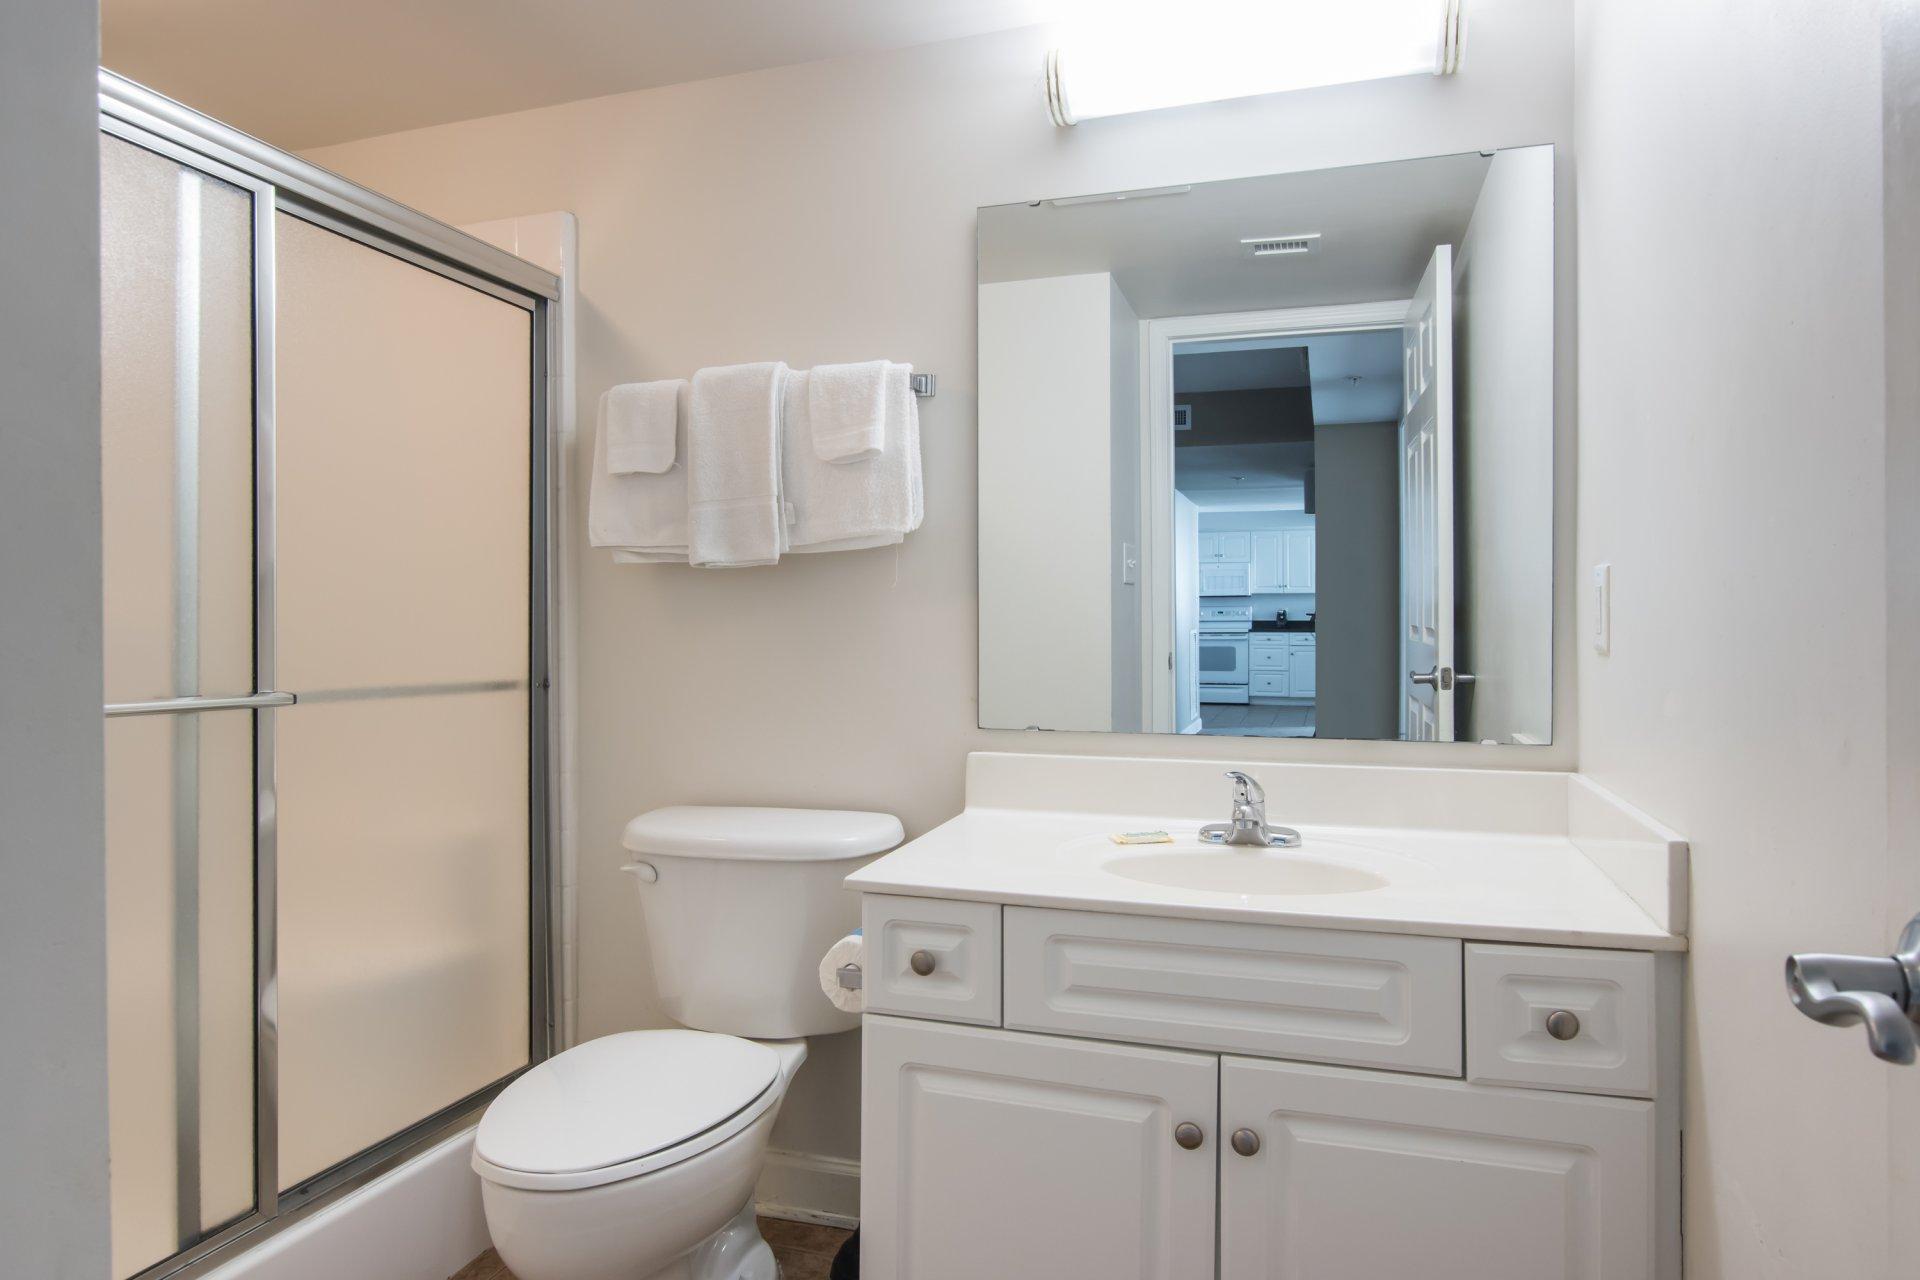 Crescent Keyes - 1102 - Ocean Front Condo- North Myrtle Beach Rental